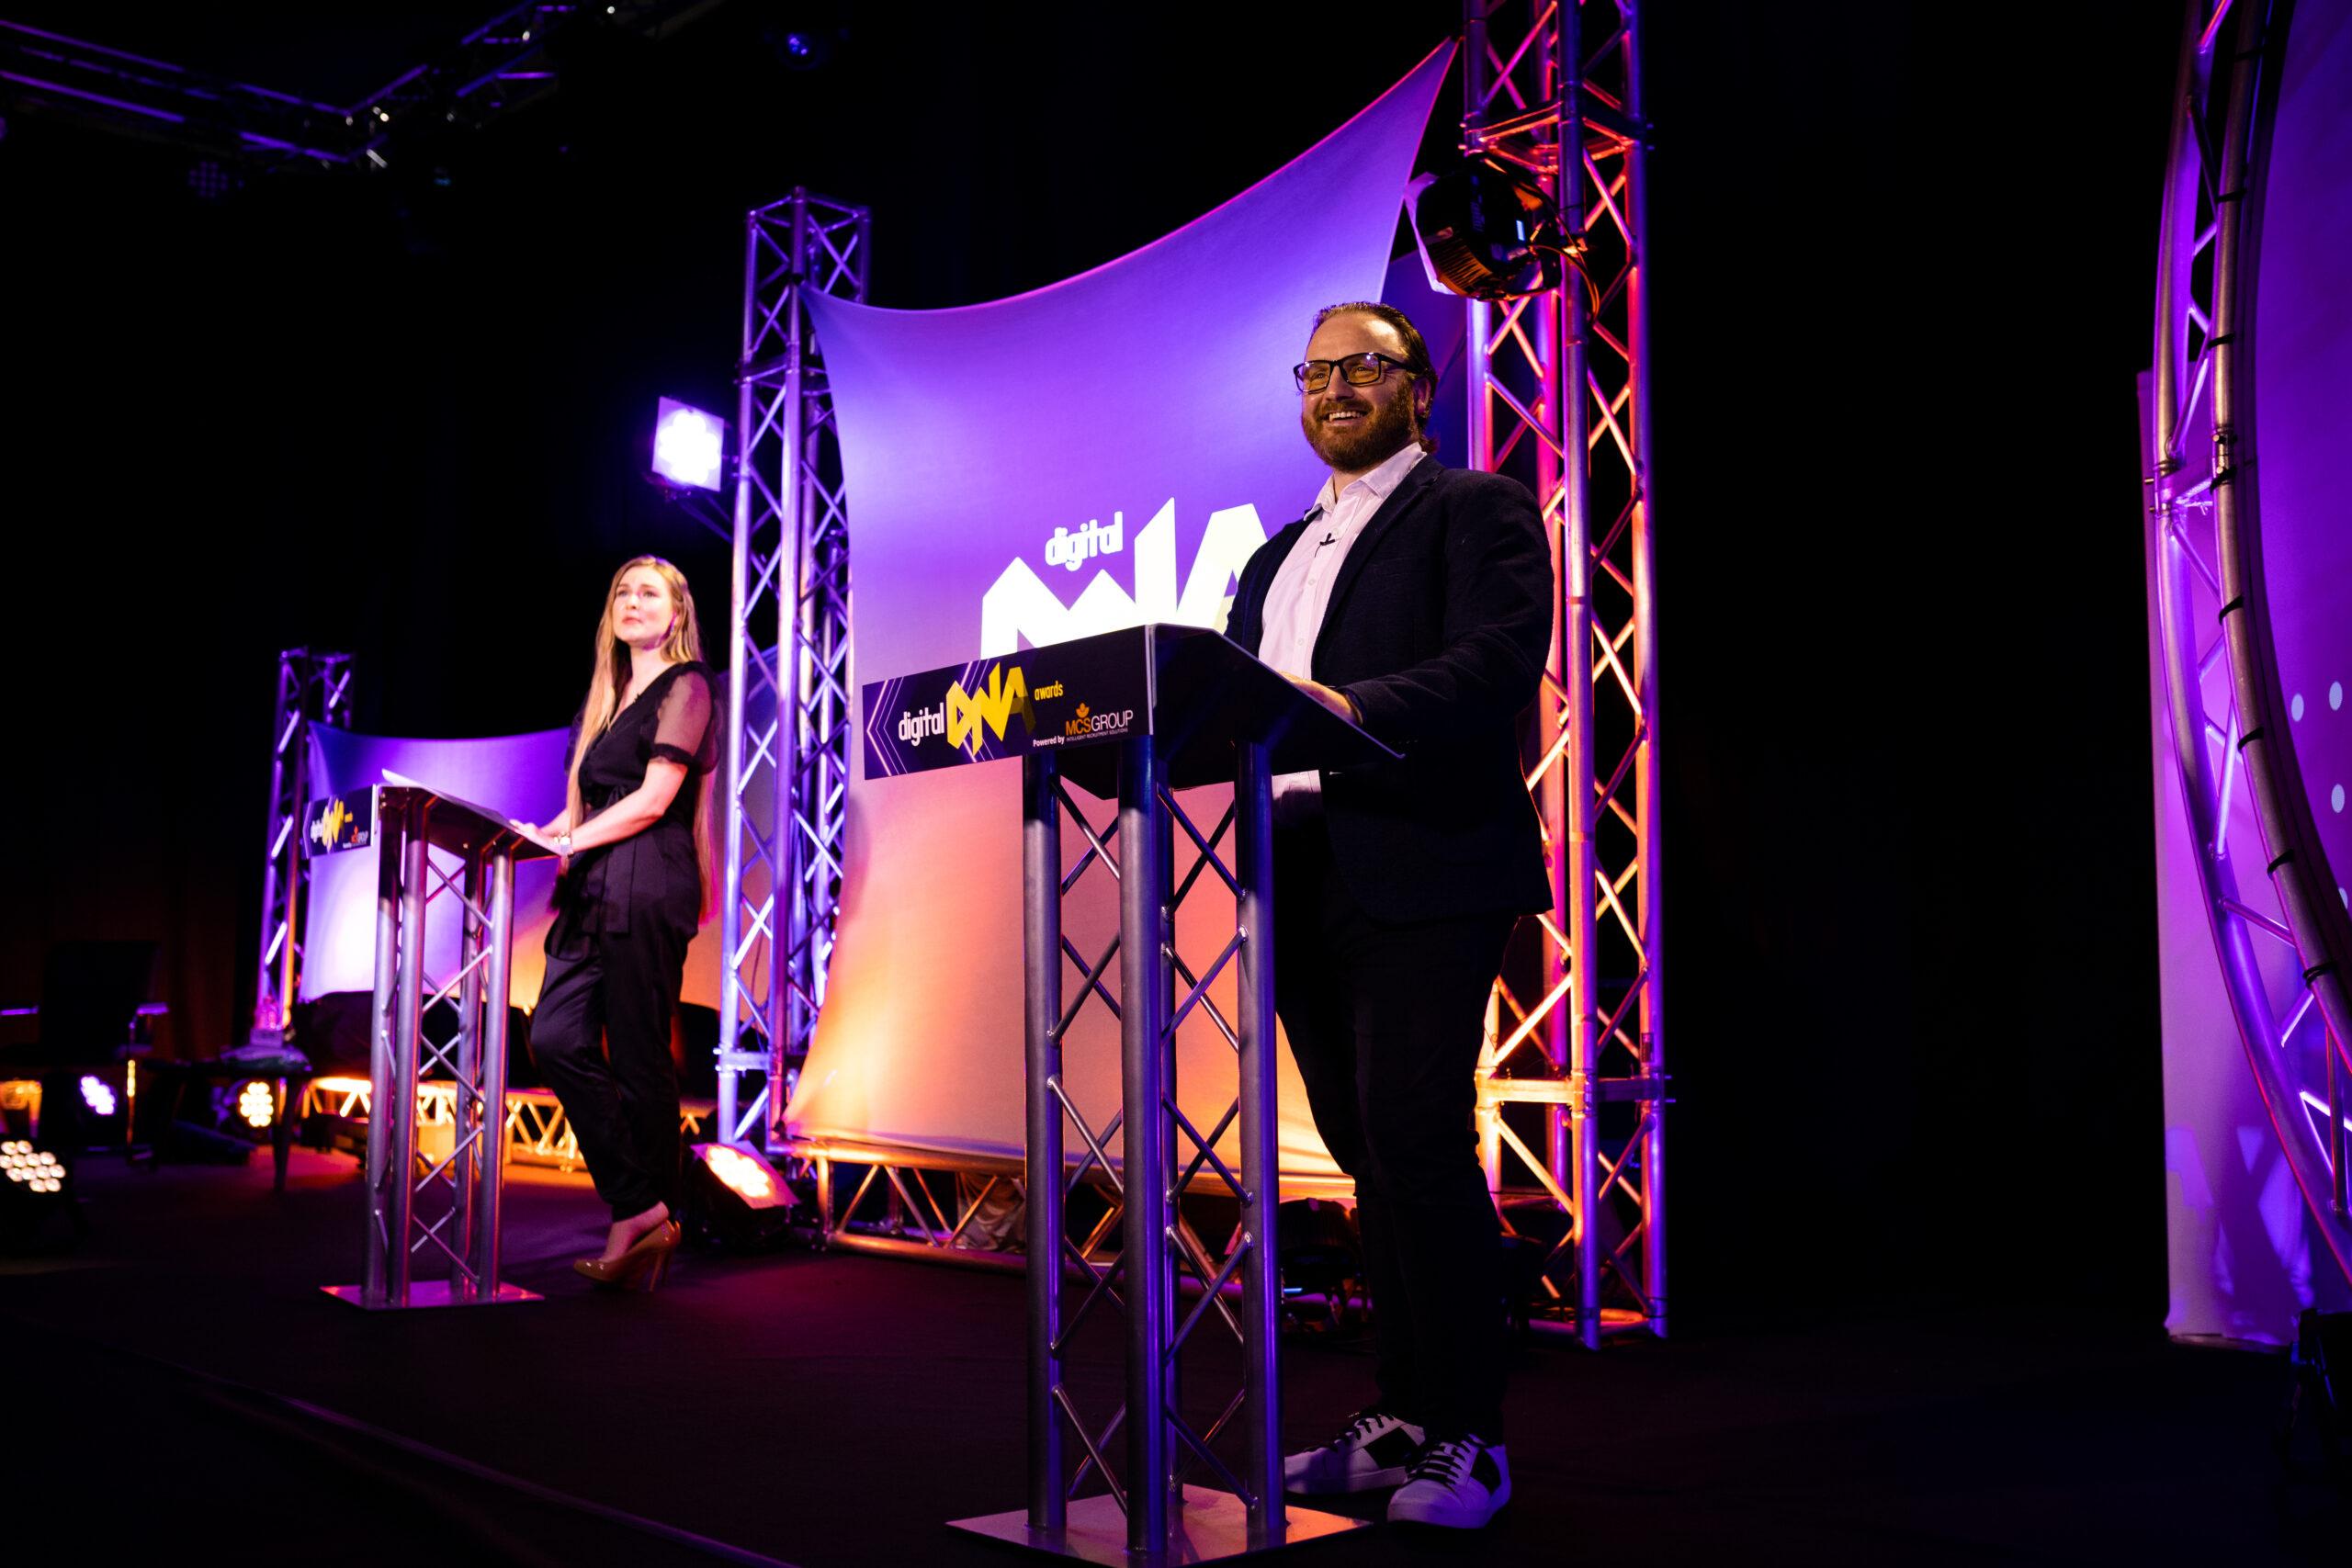 Simon Bailie and Zoe Salmon present the Digital DNA Awards 2020